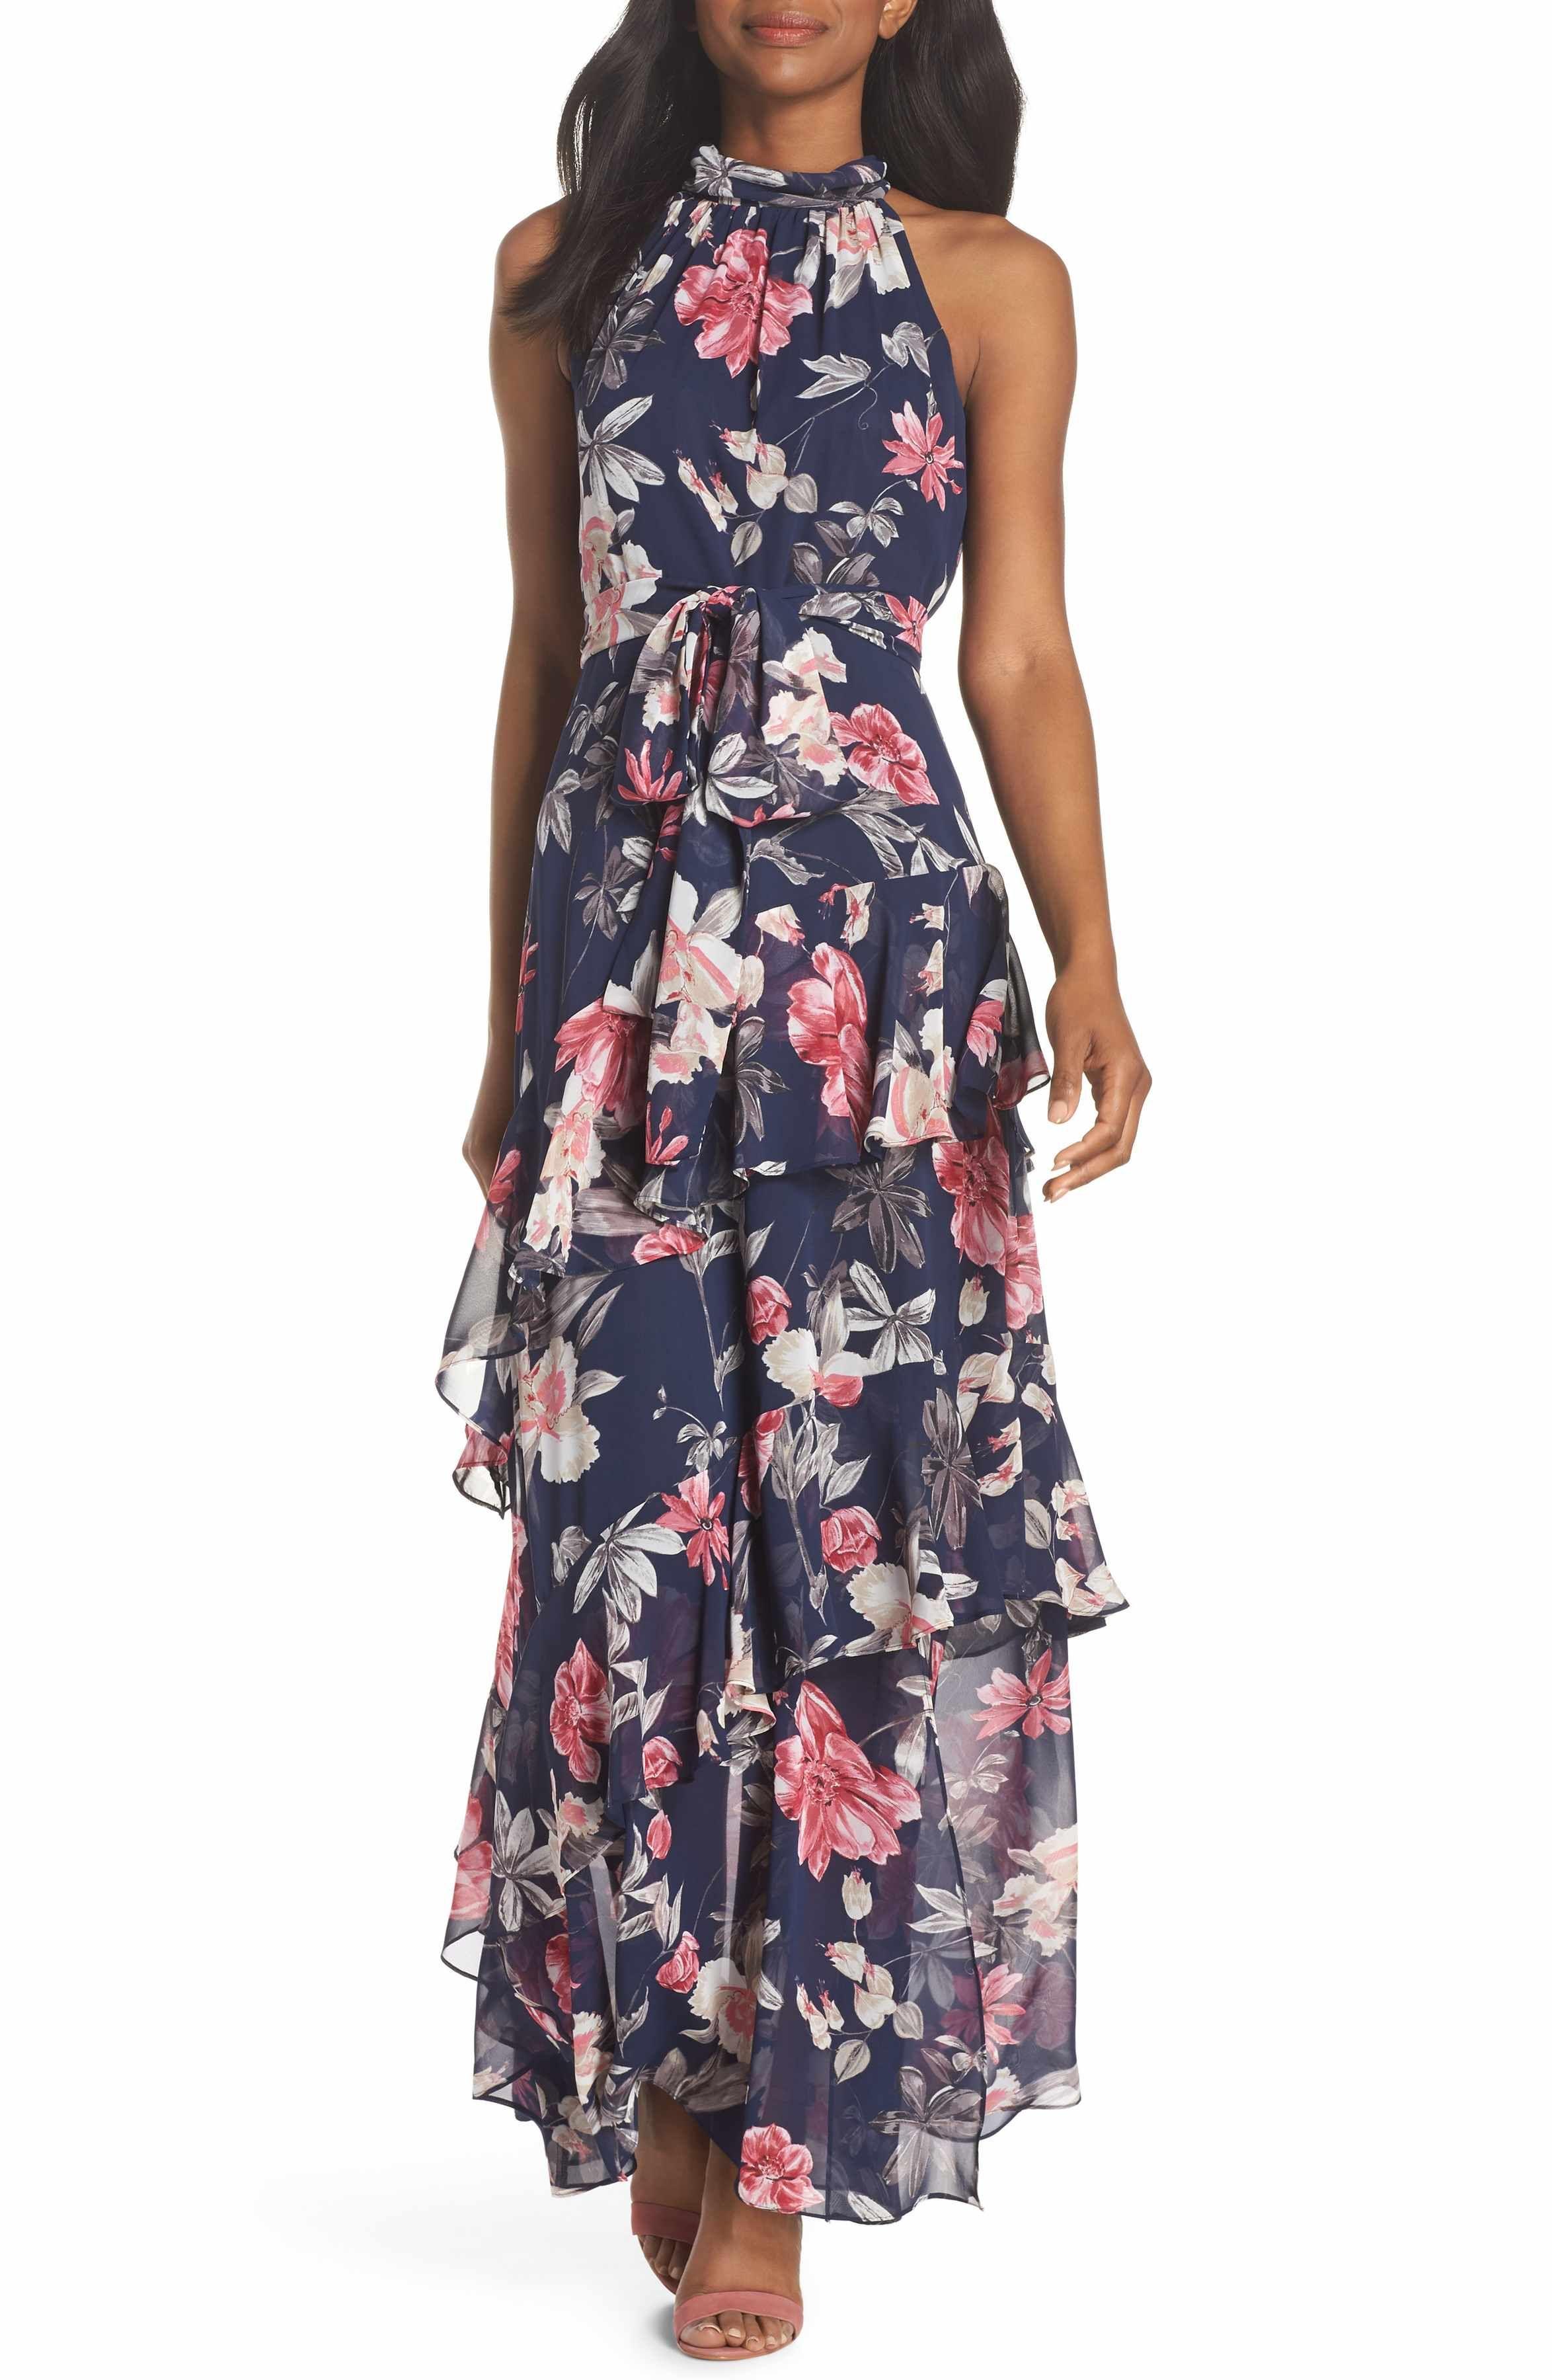 5e8c92a6 Main Image - Eliza J Halter Neck Ruffle Chiffon Maxi Dress | Dresses ...